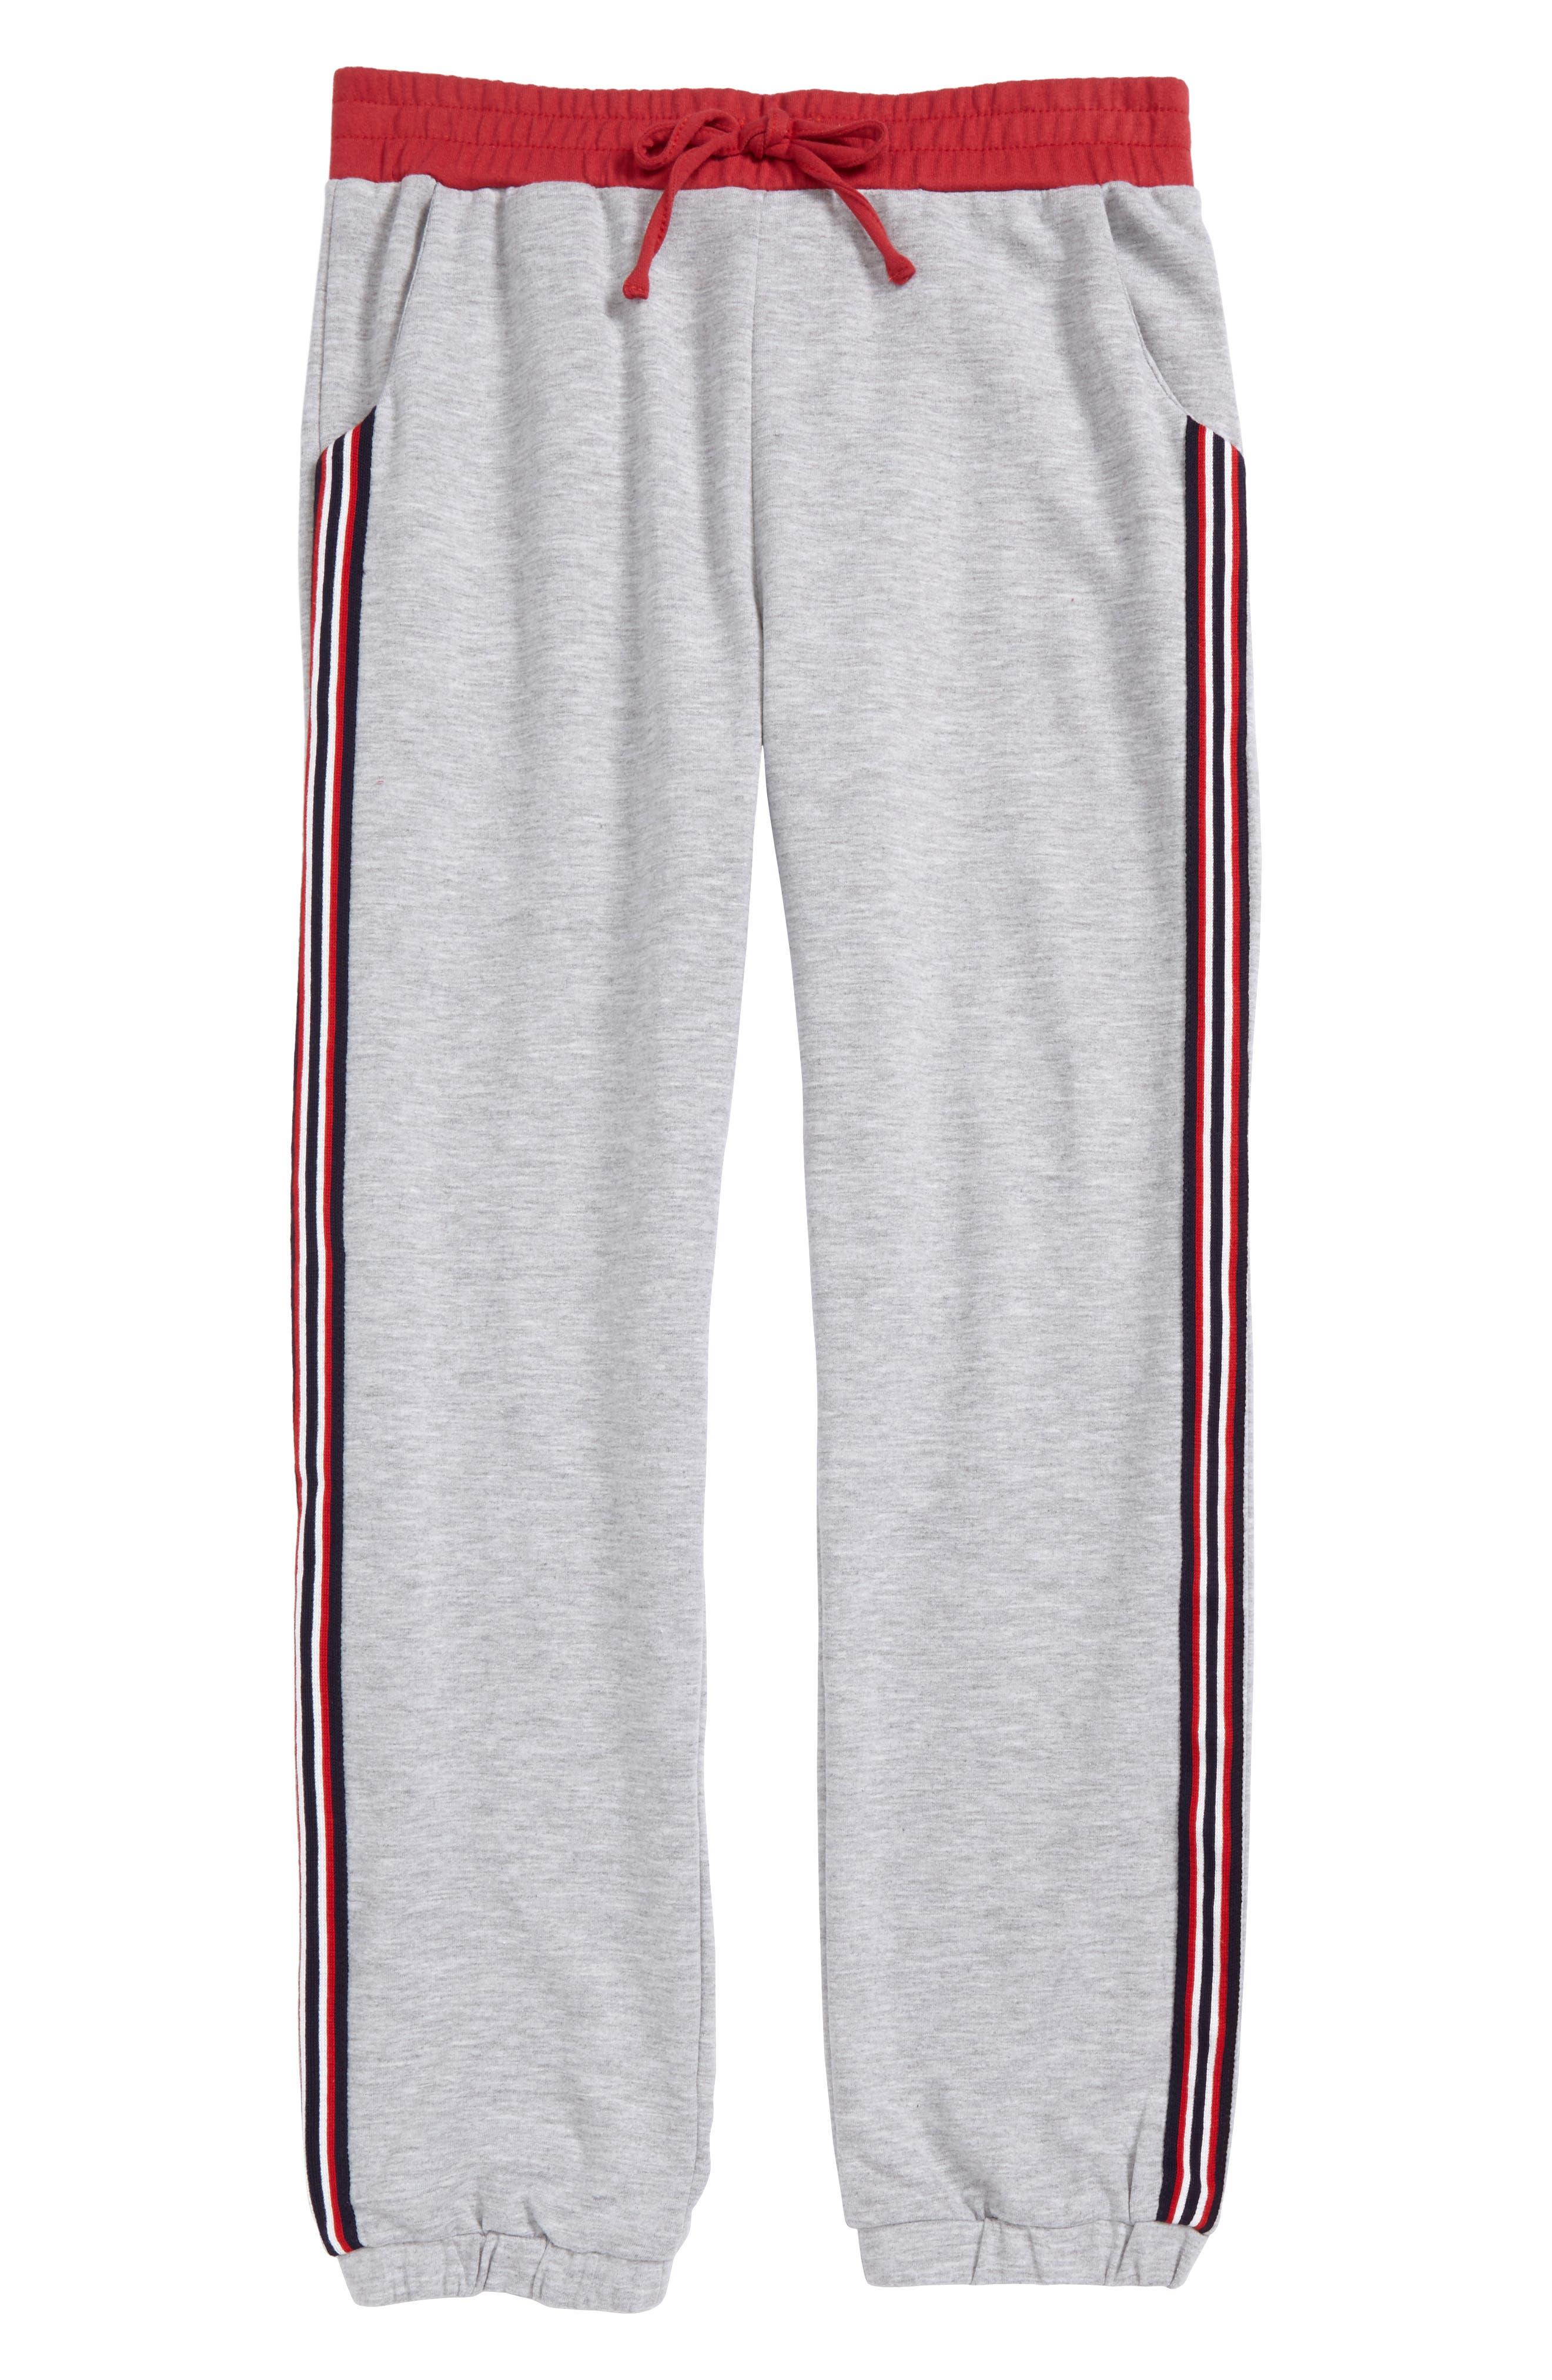 Alternate Image 1 Selected - Ten Sixty Sherman Side Stripe Sweatpants (Big Girls)